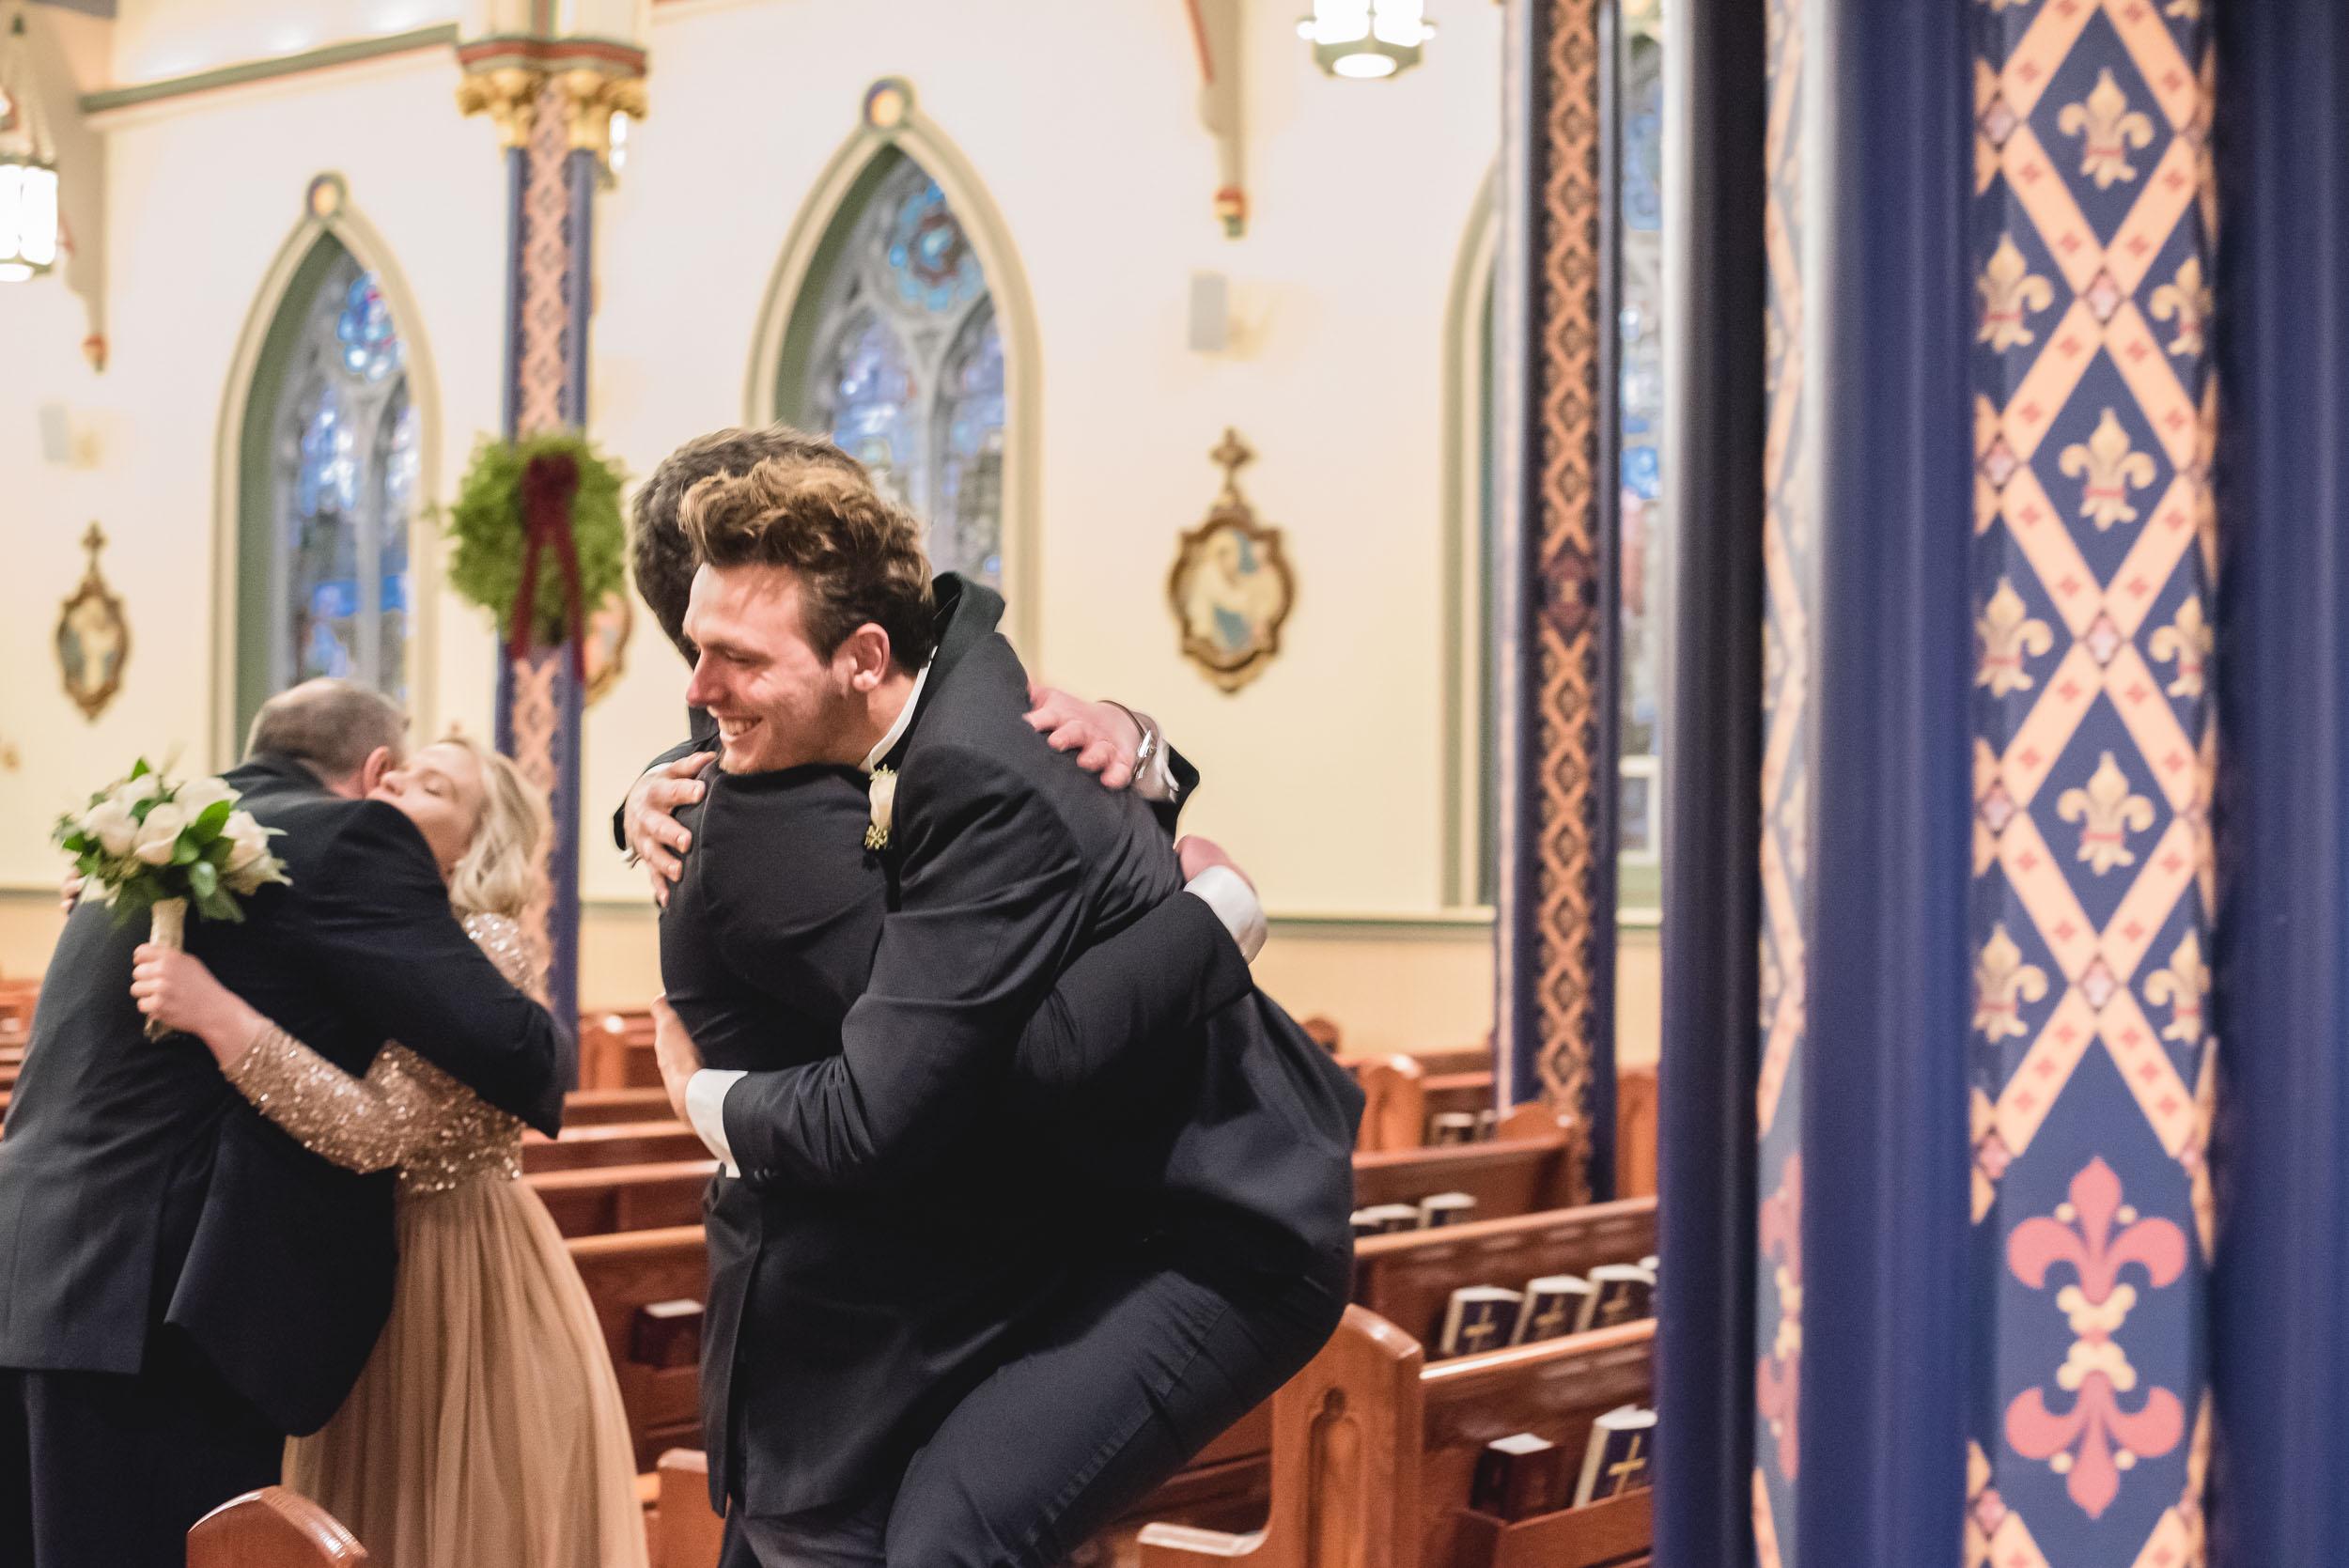 katie_mathia_wedding_church_morristown_new_jersey(2of3).jpg